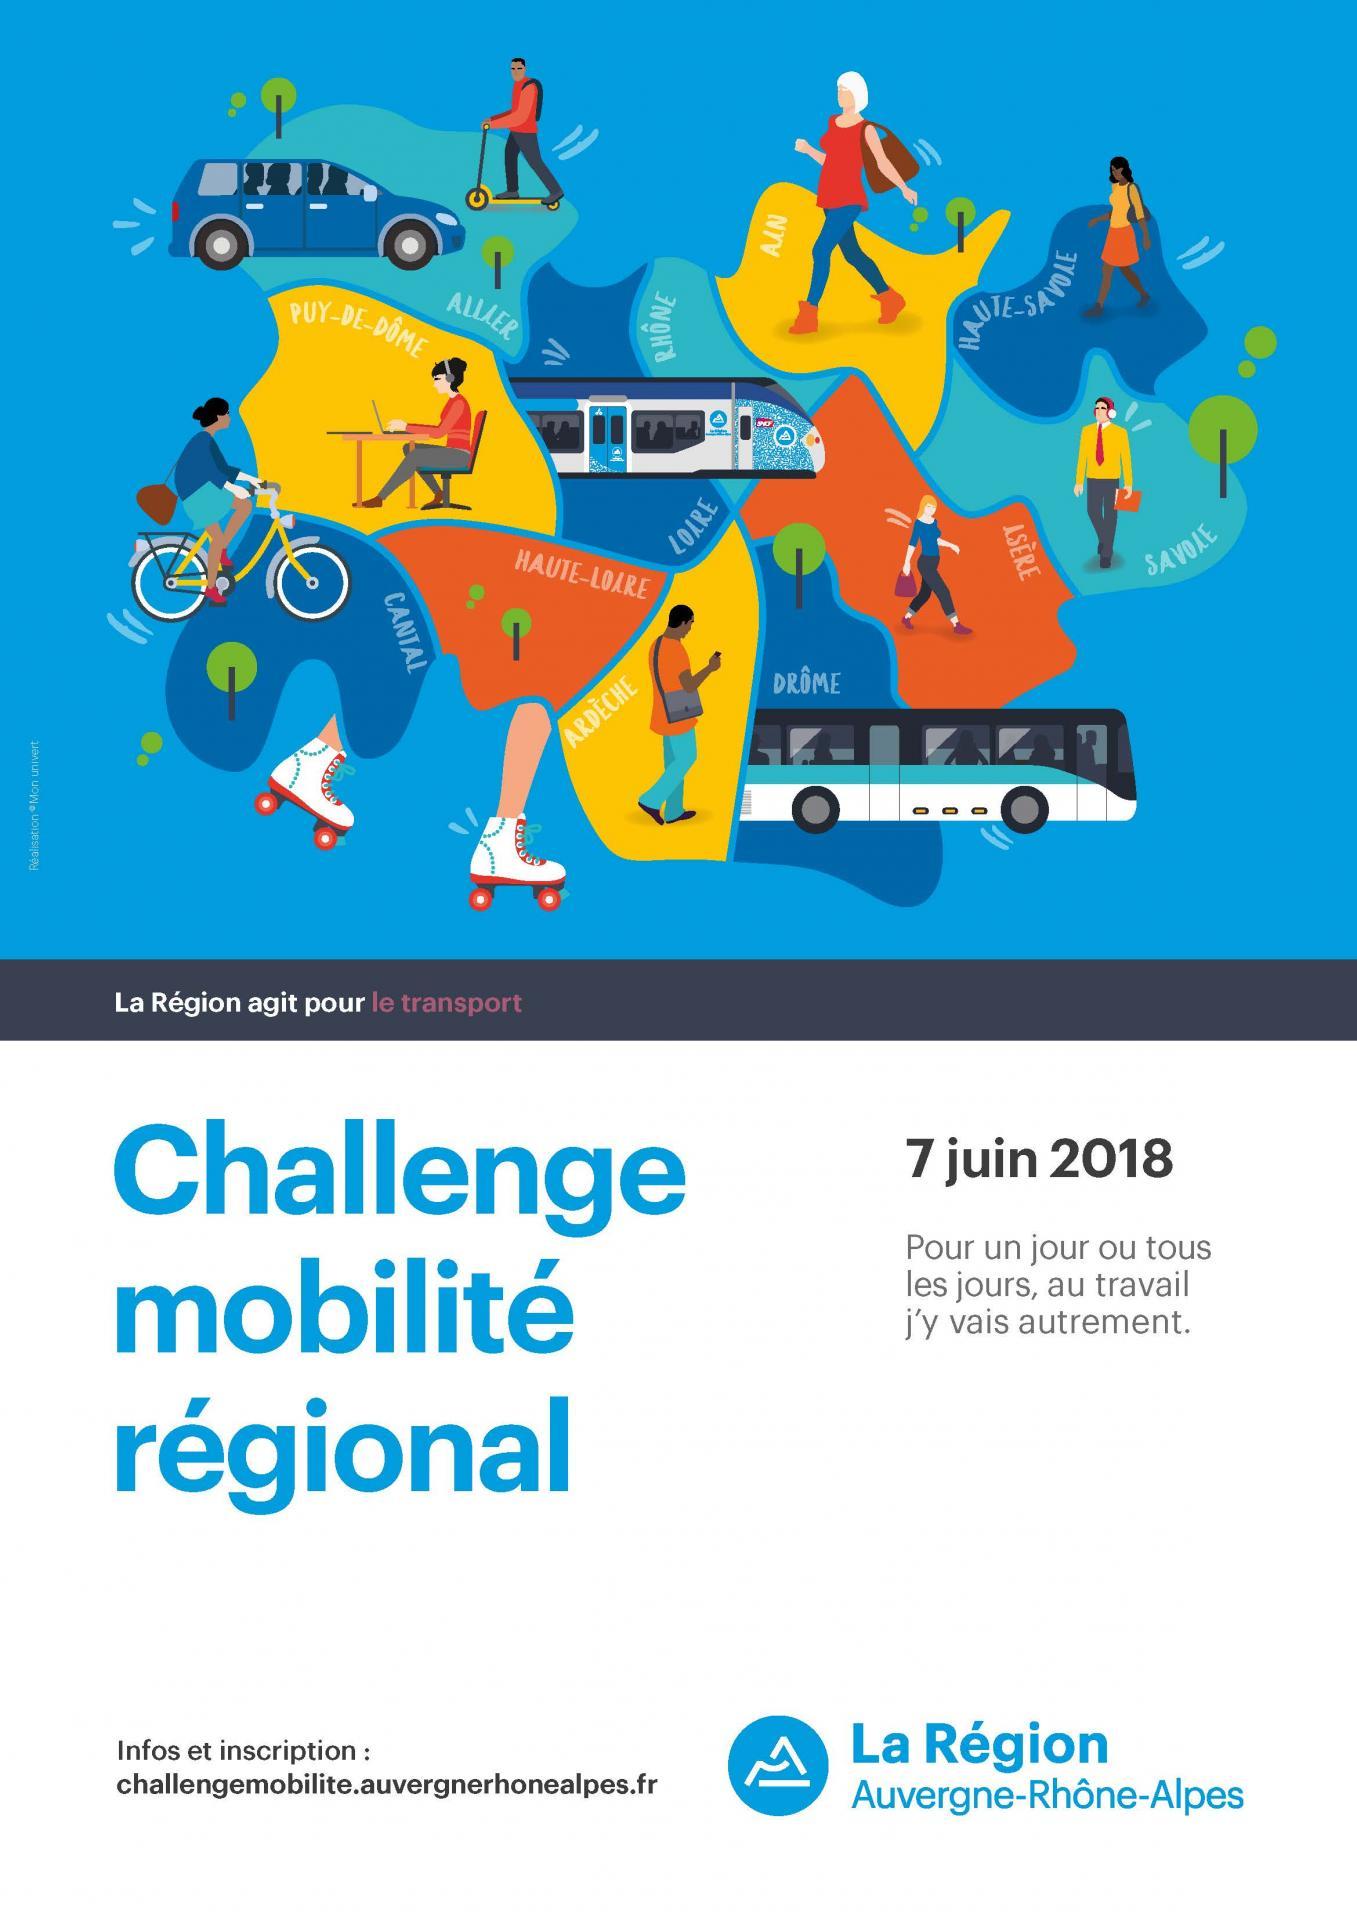 challenge mobilit u00e9 auvergne rh u00f4ne alpes - get ready